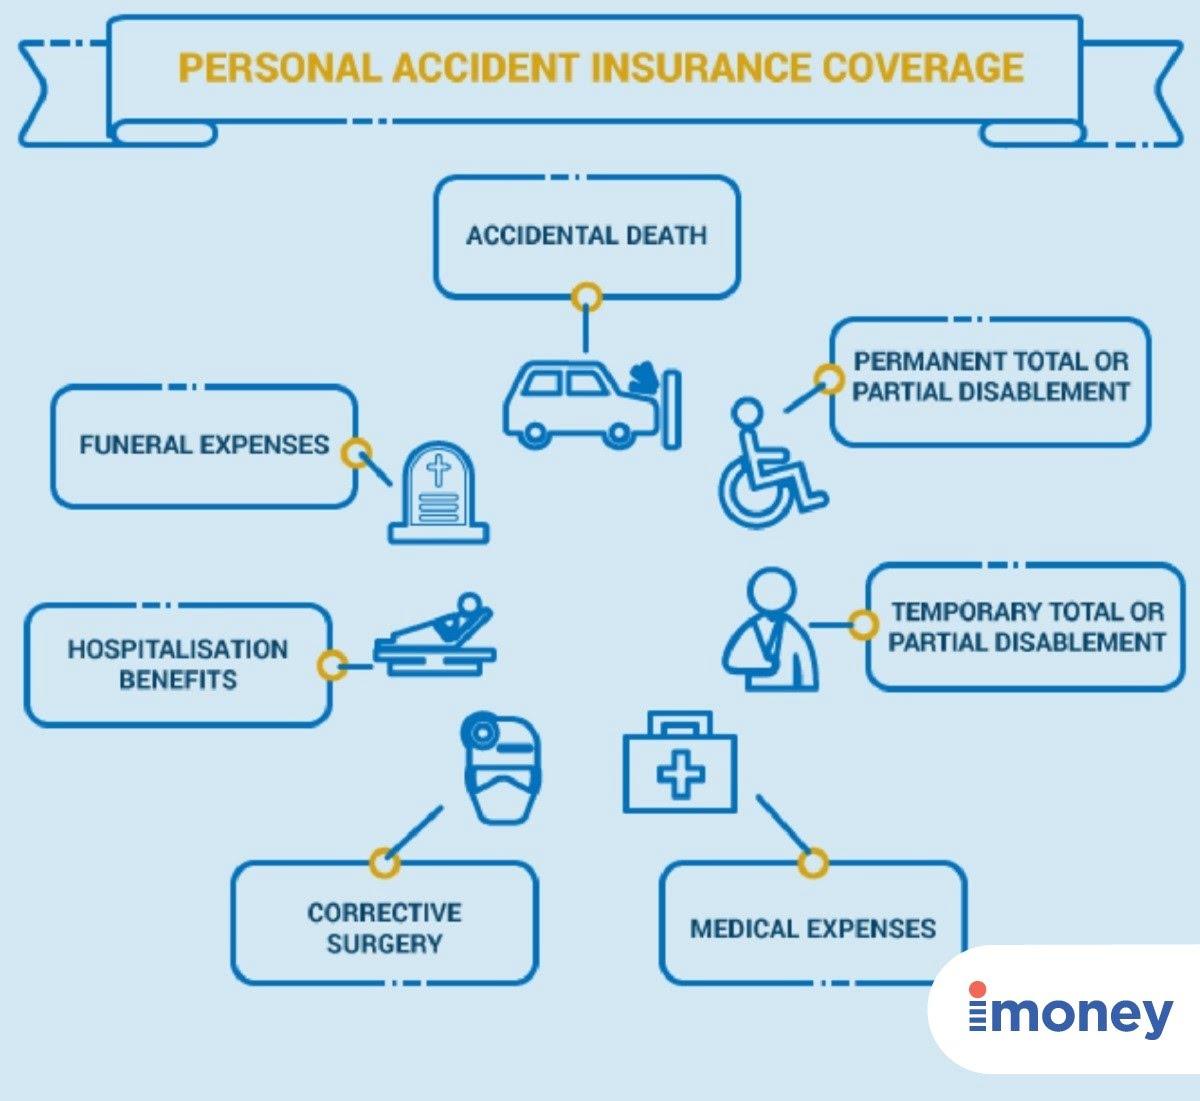 PA insurance coverage